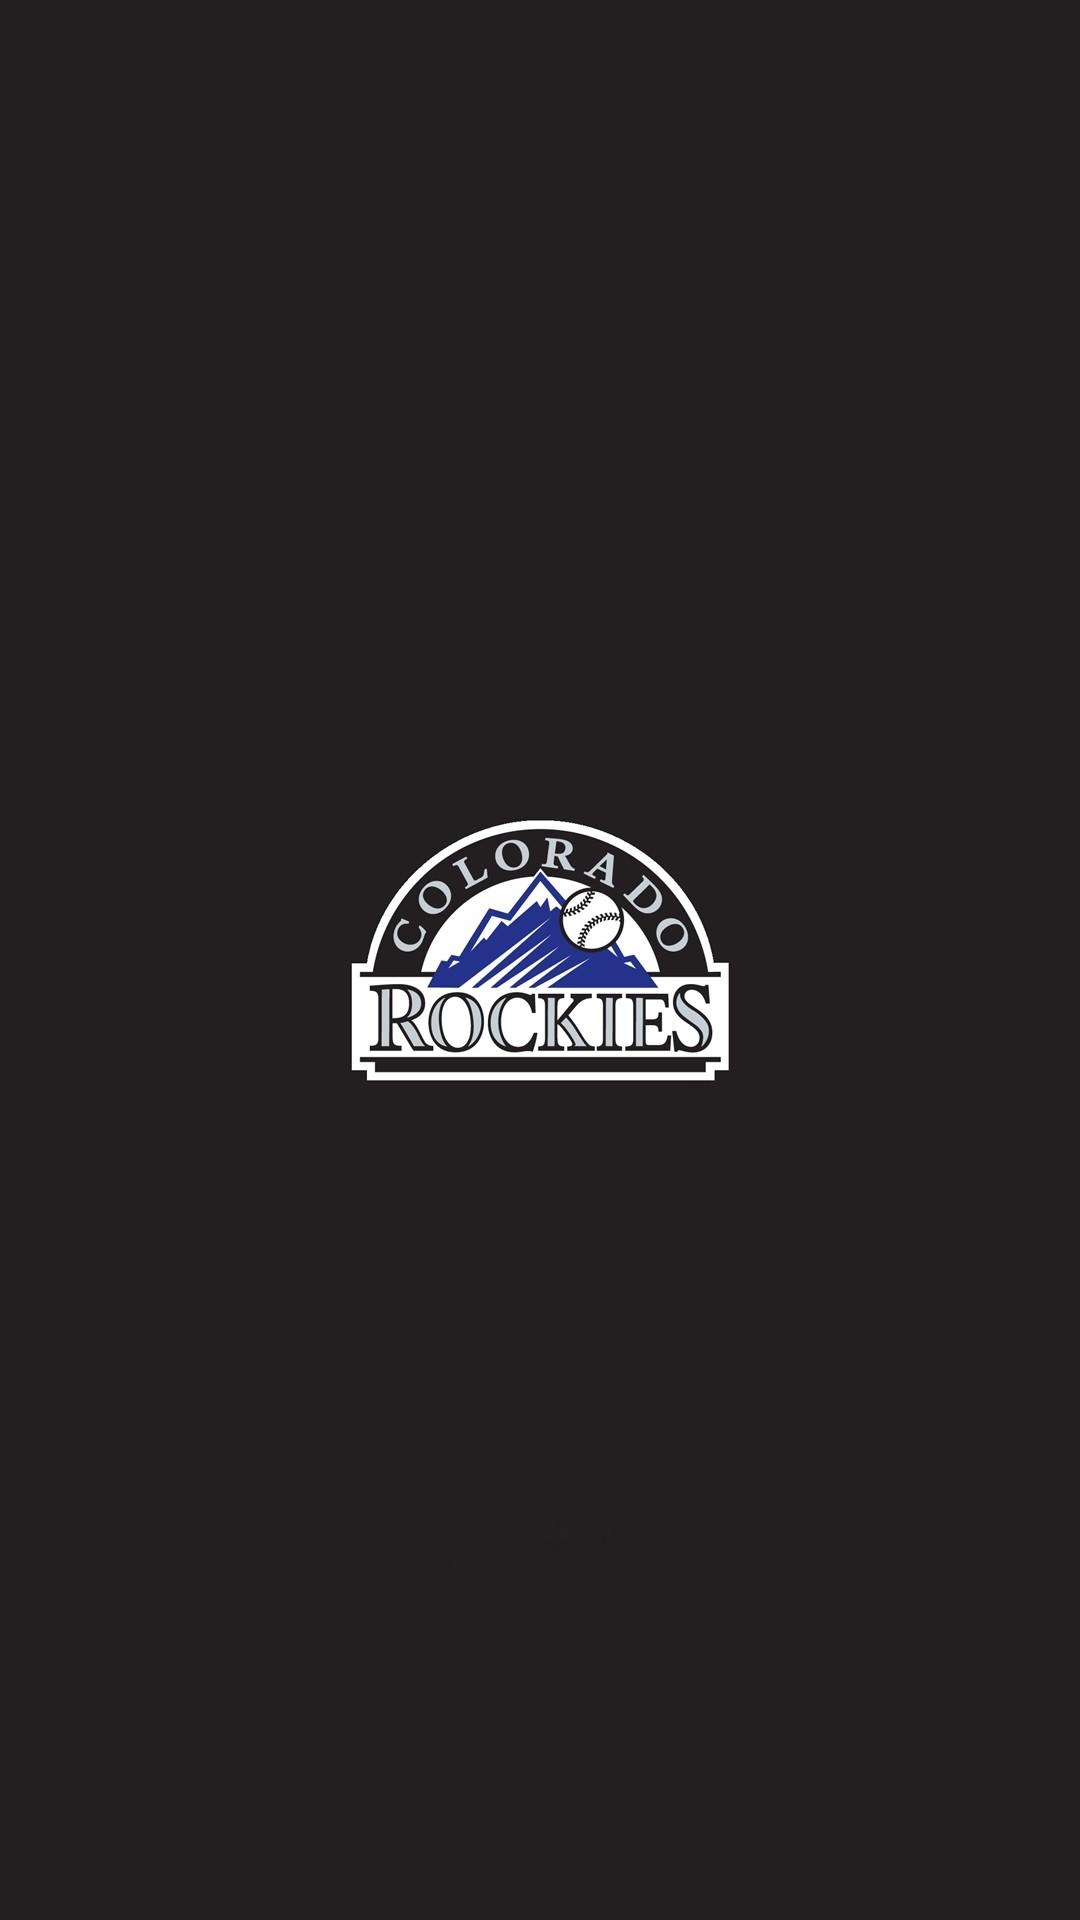 Colorado Rockies Iphone 7 Hd Background for Colorado Rockies Phone  Wallpapers …